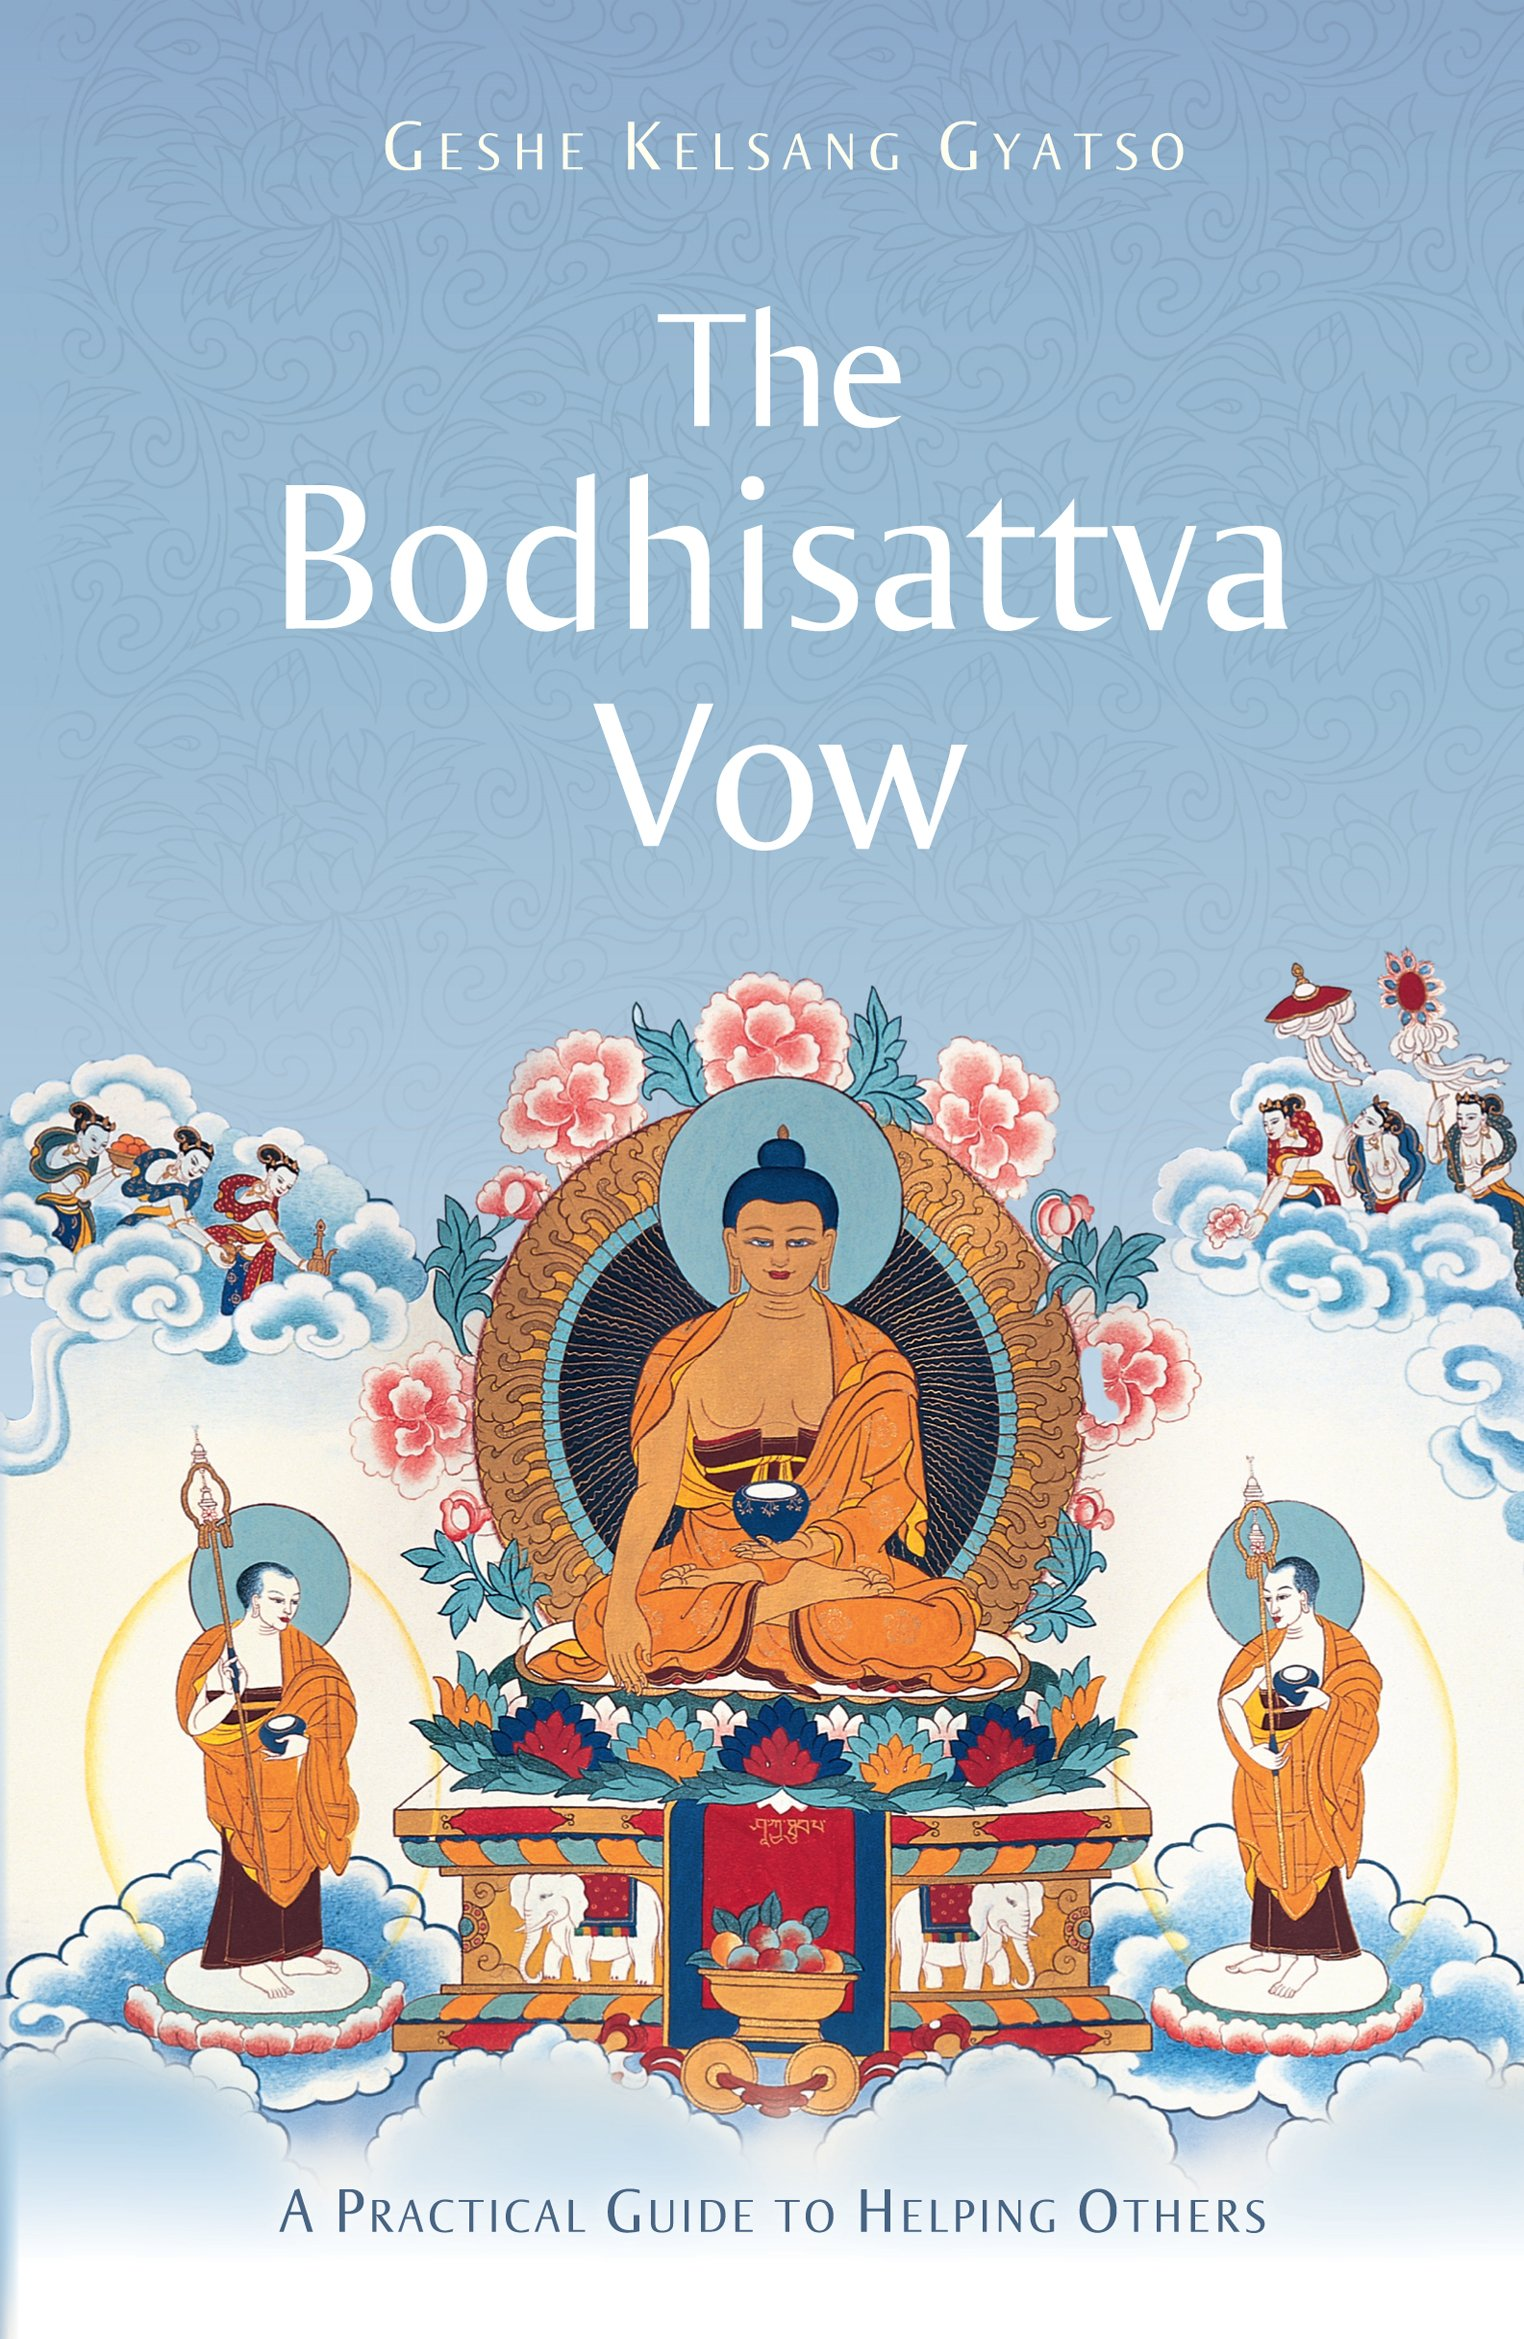 Le vœu du bodhisattva